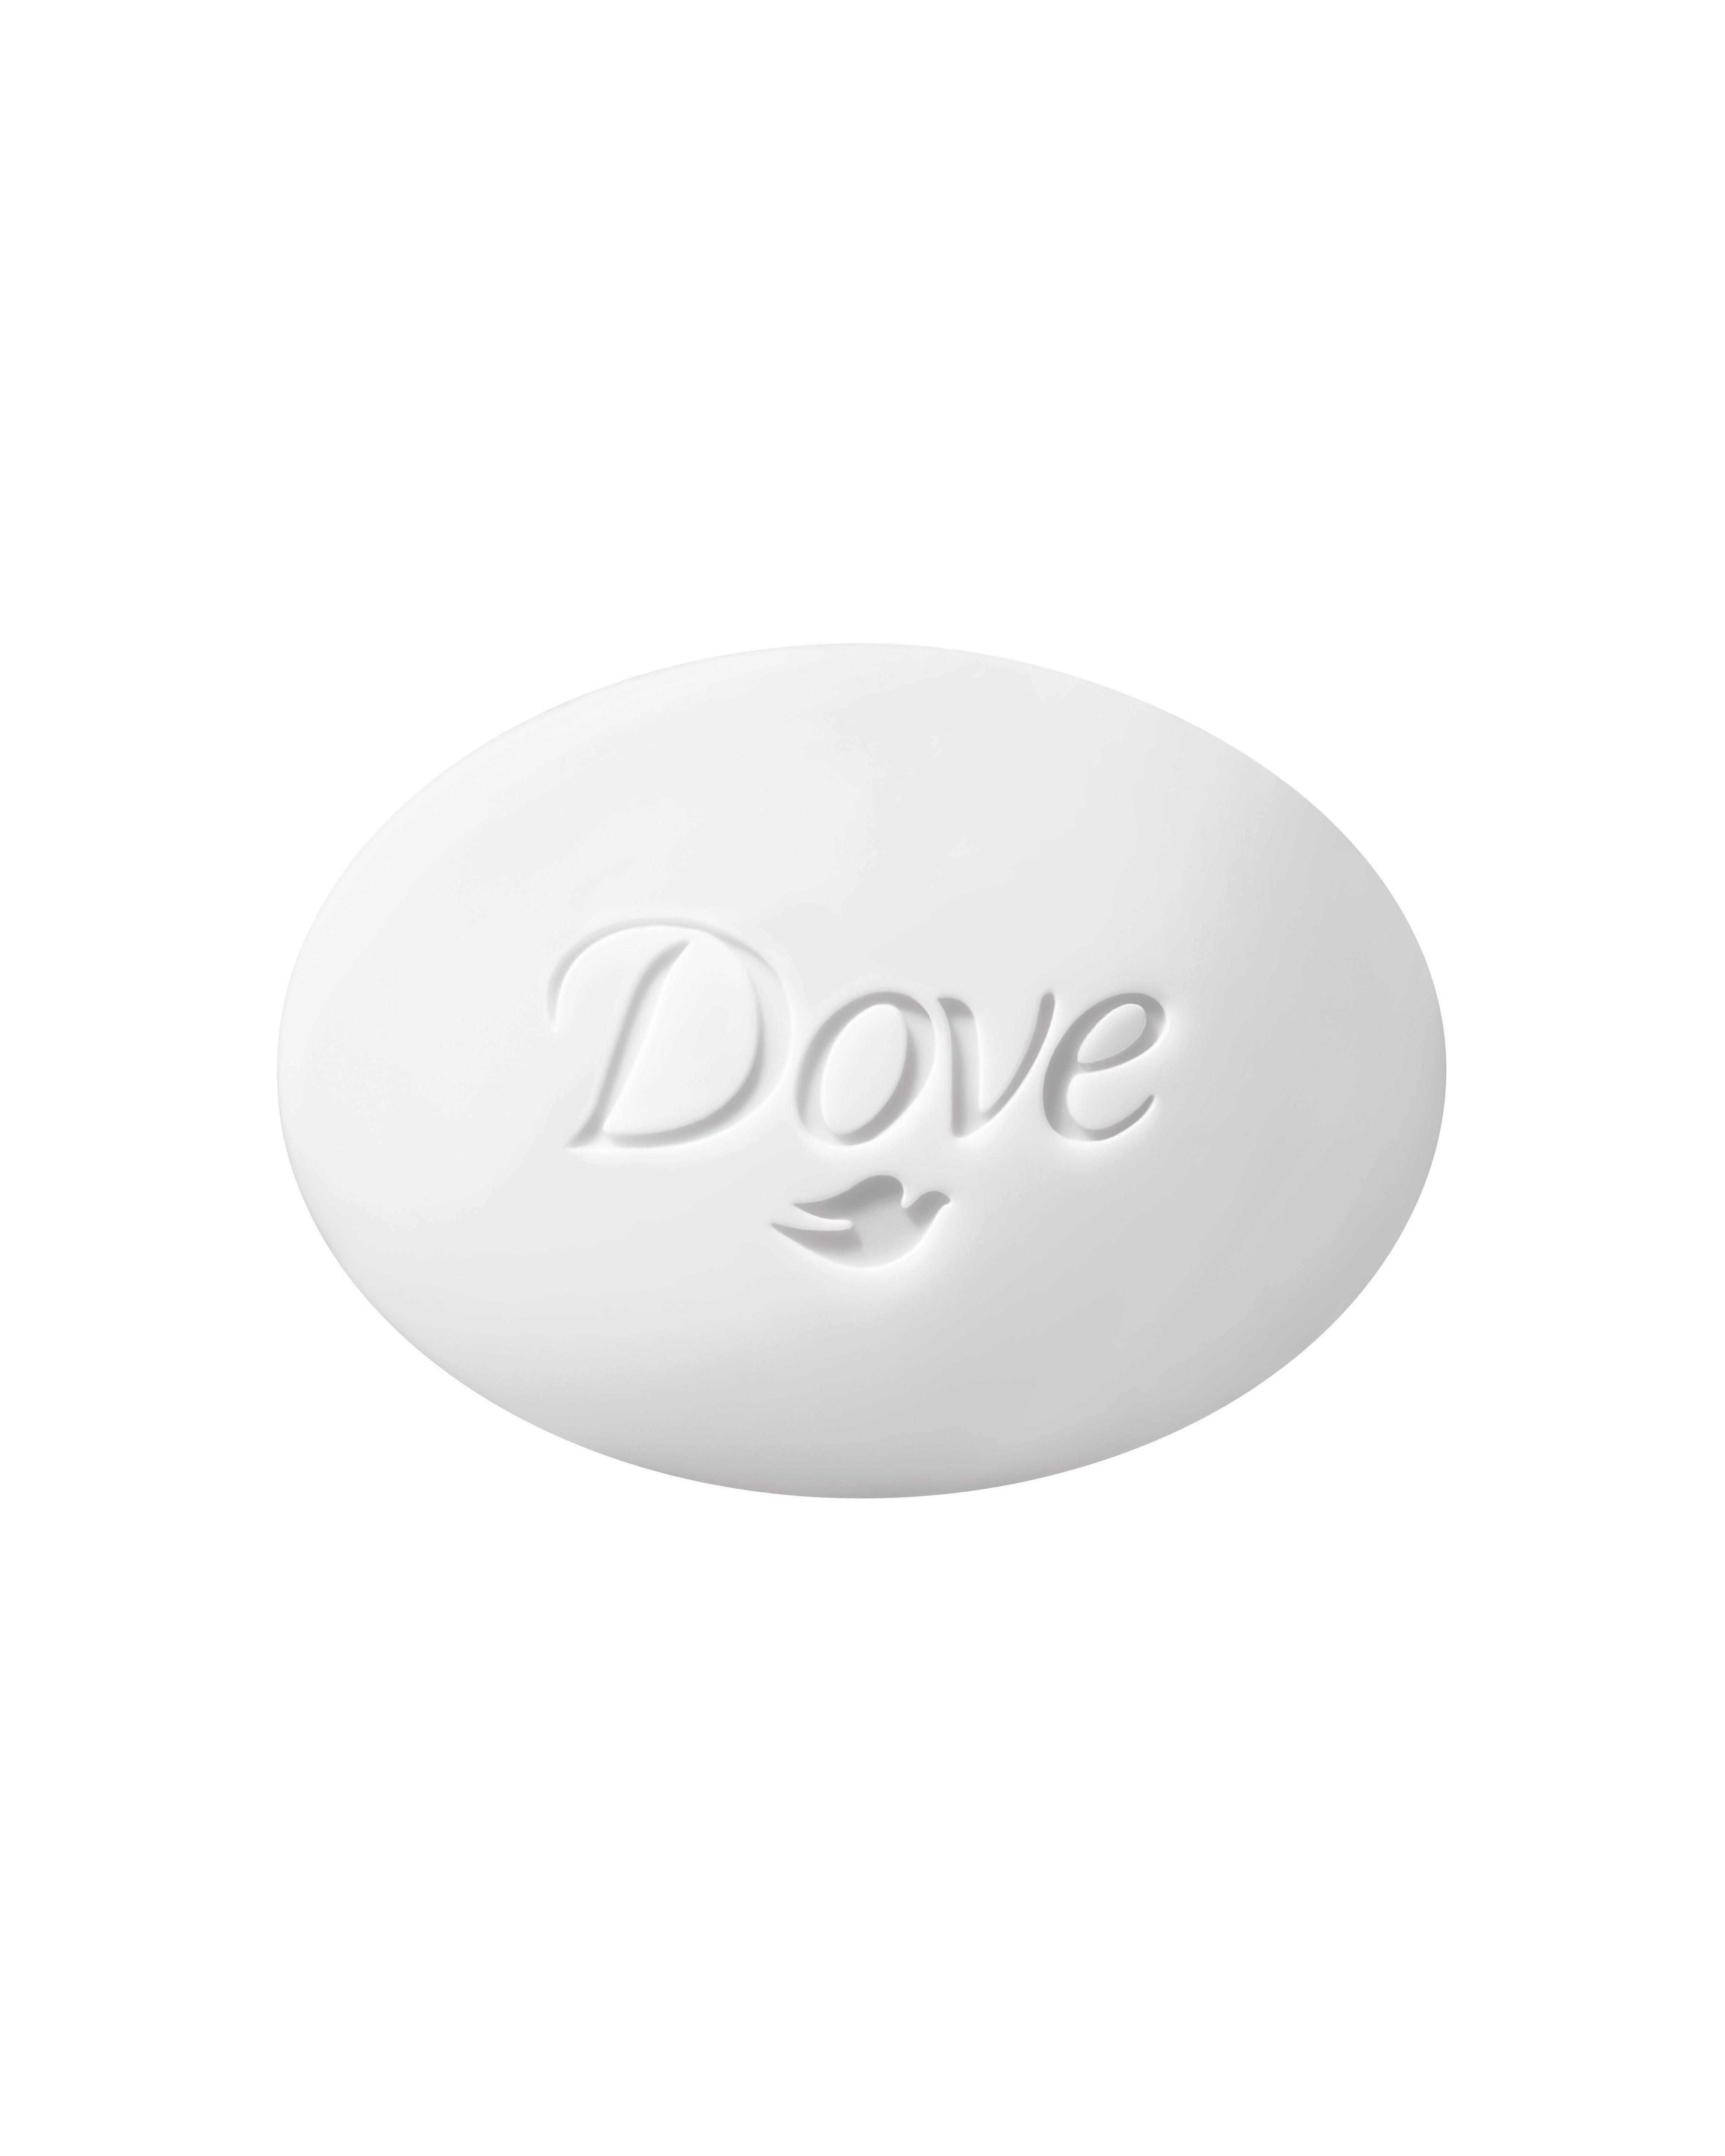 dove-beauty-bar-0314.jpg